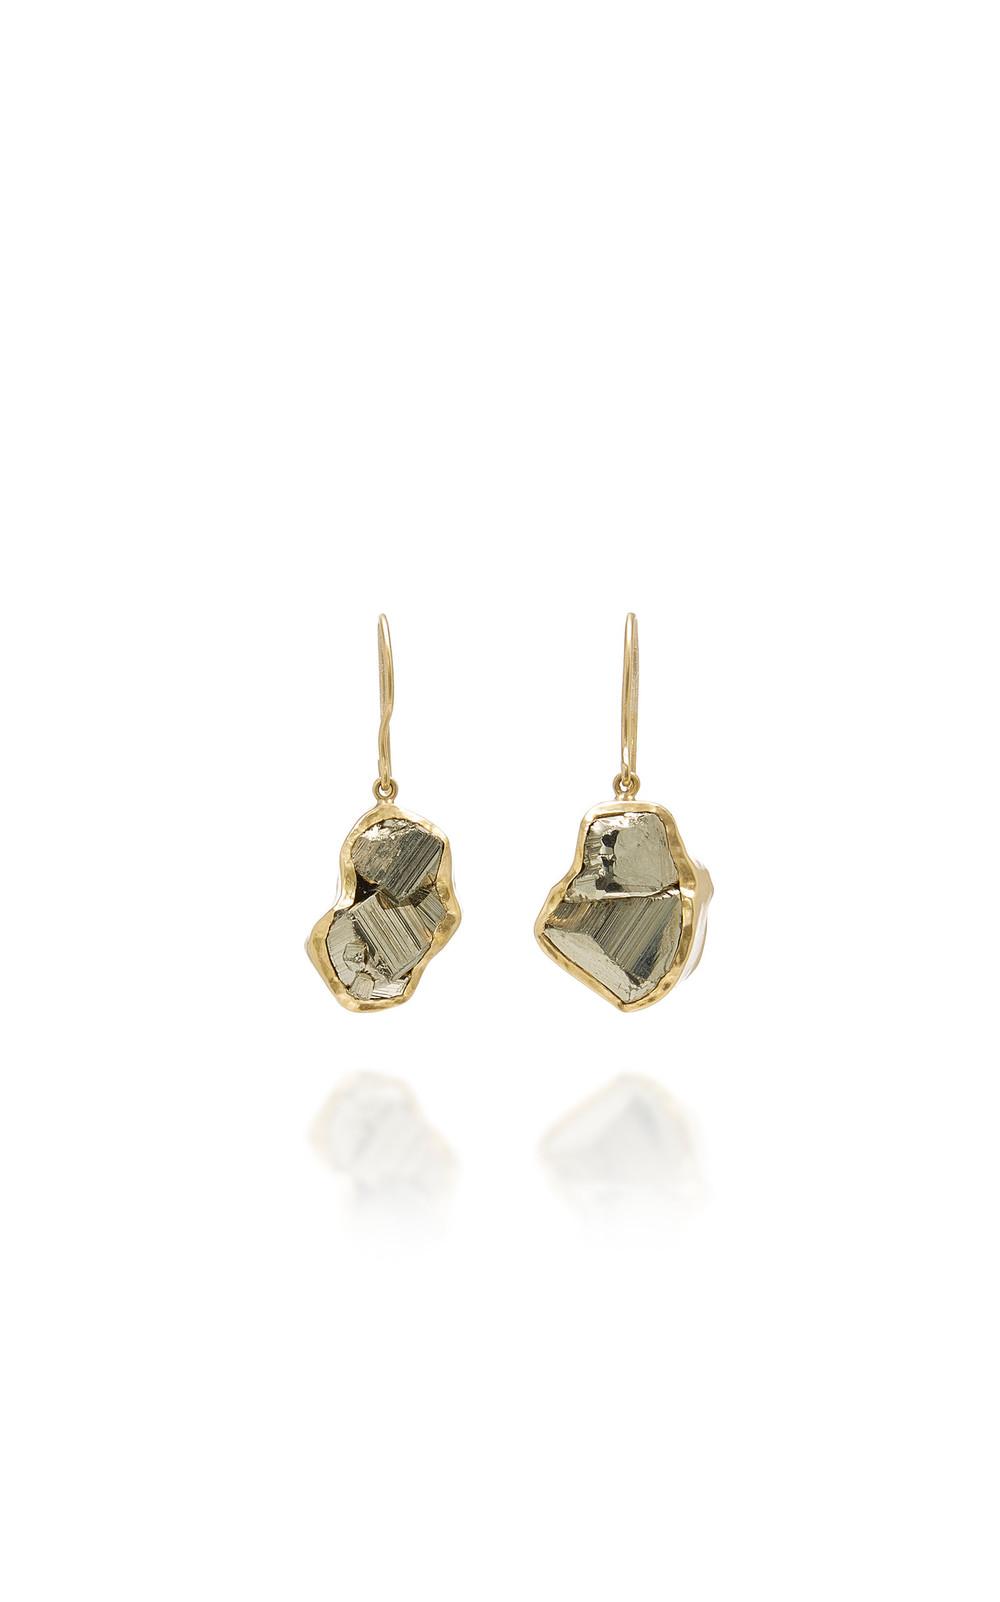 Pippa Small Dazzle Single Drop Pyrite Earrings in gold